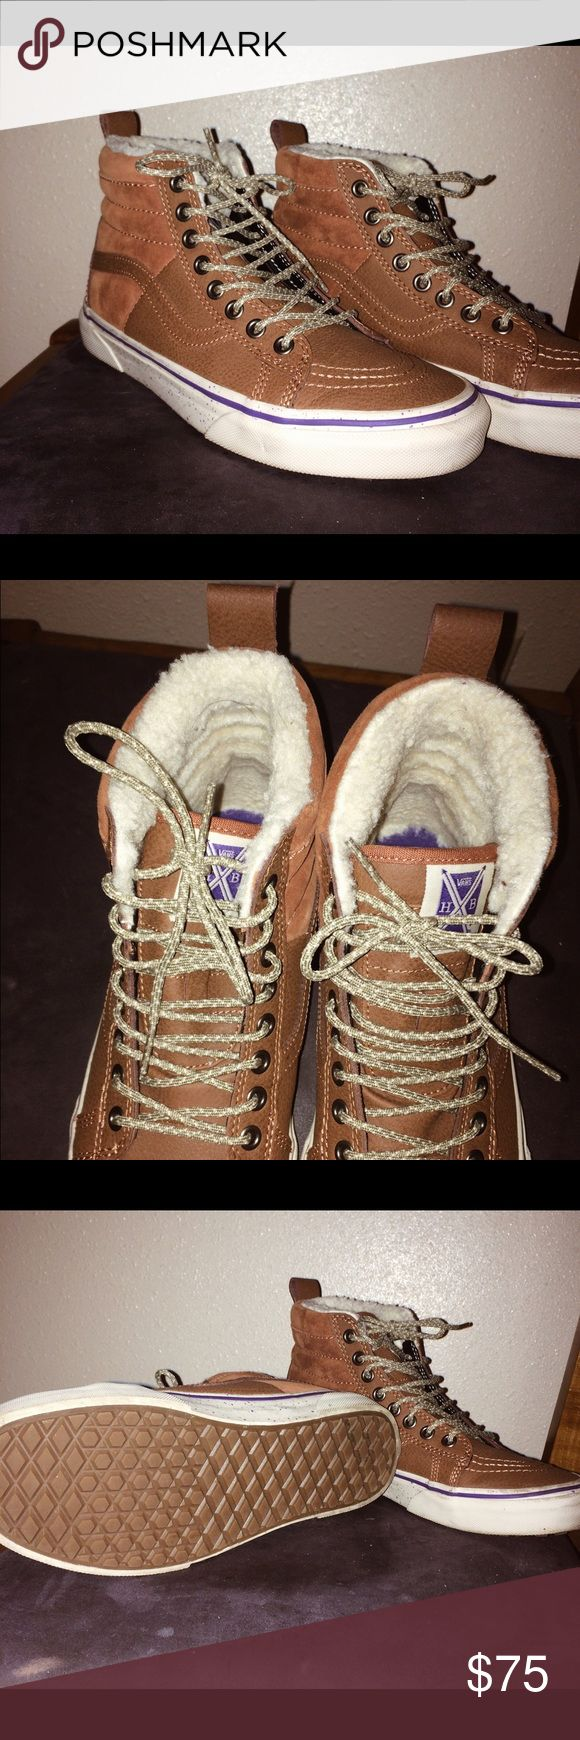 Brand new Vans- Hana Beaman sk8-hi 46 MTE Hana Beaman sk8-hi 46 MTE's only worn once. Brown suede and leather, purple detailing, scotchgard protected. Vans Shoes Sneakers